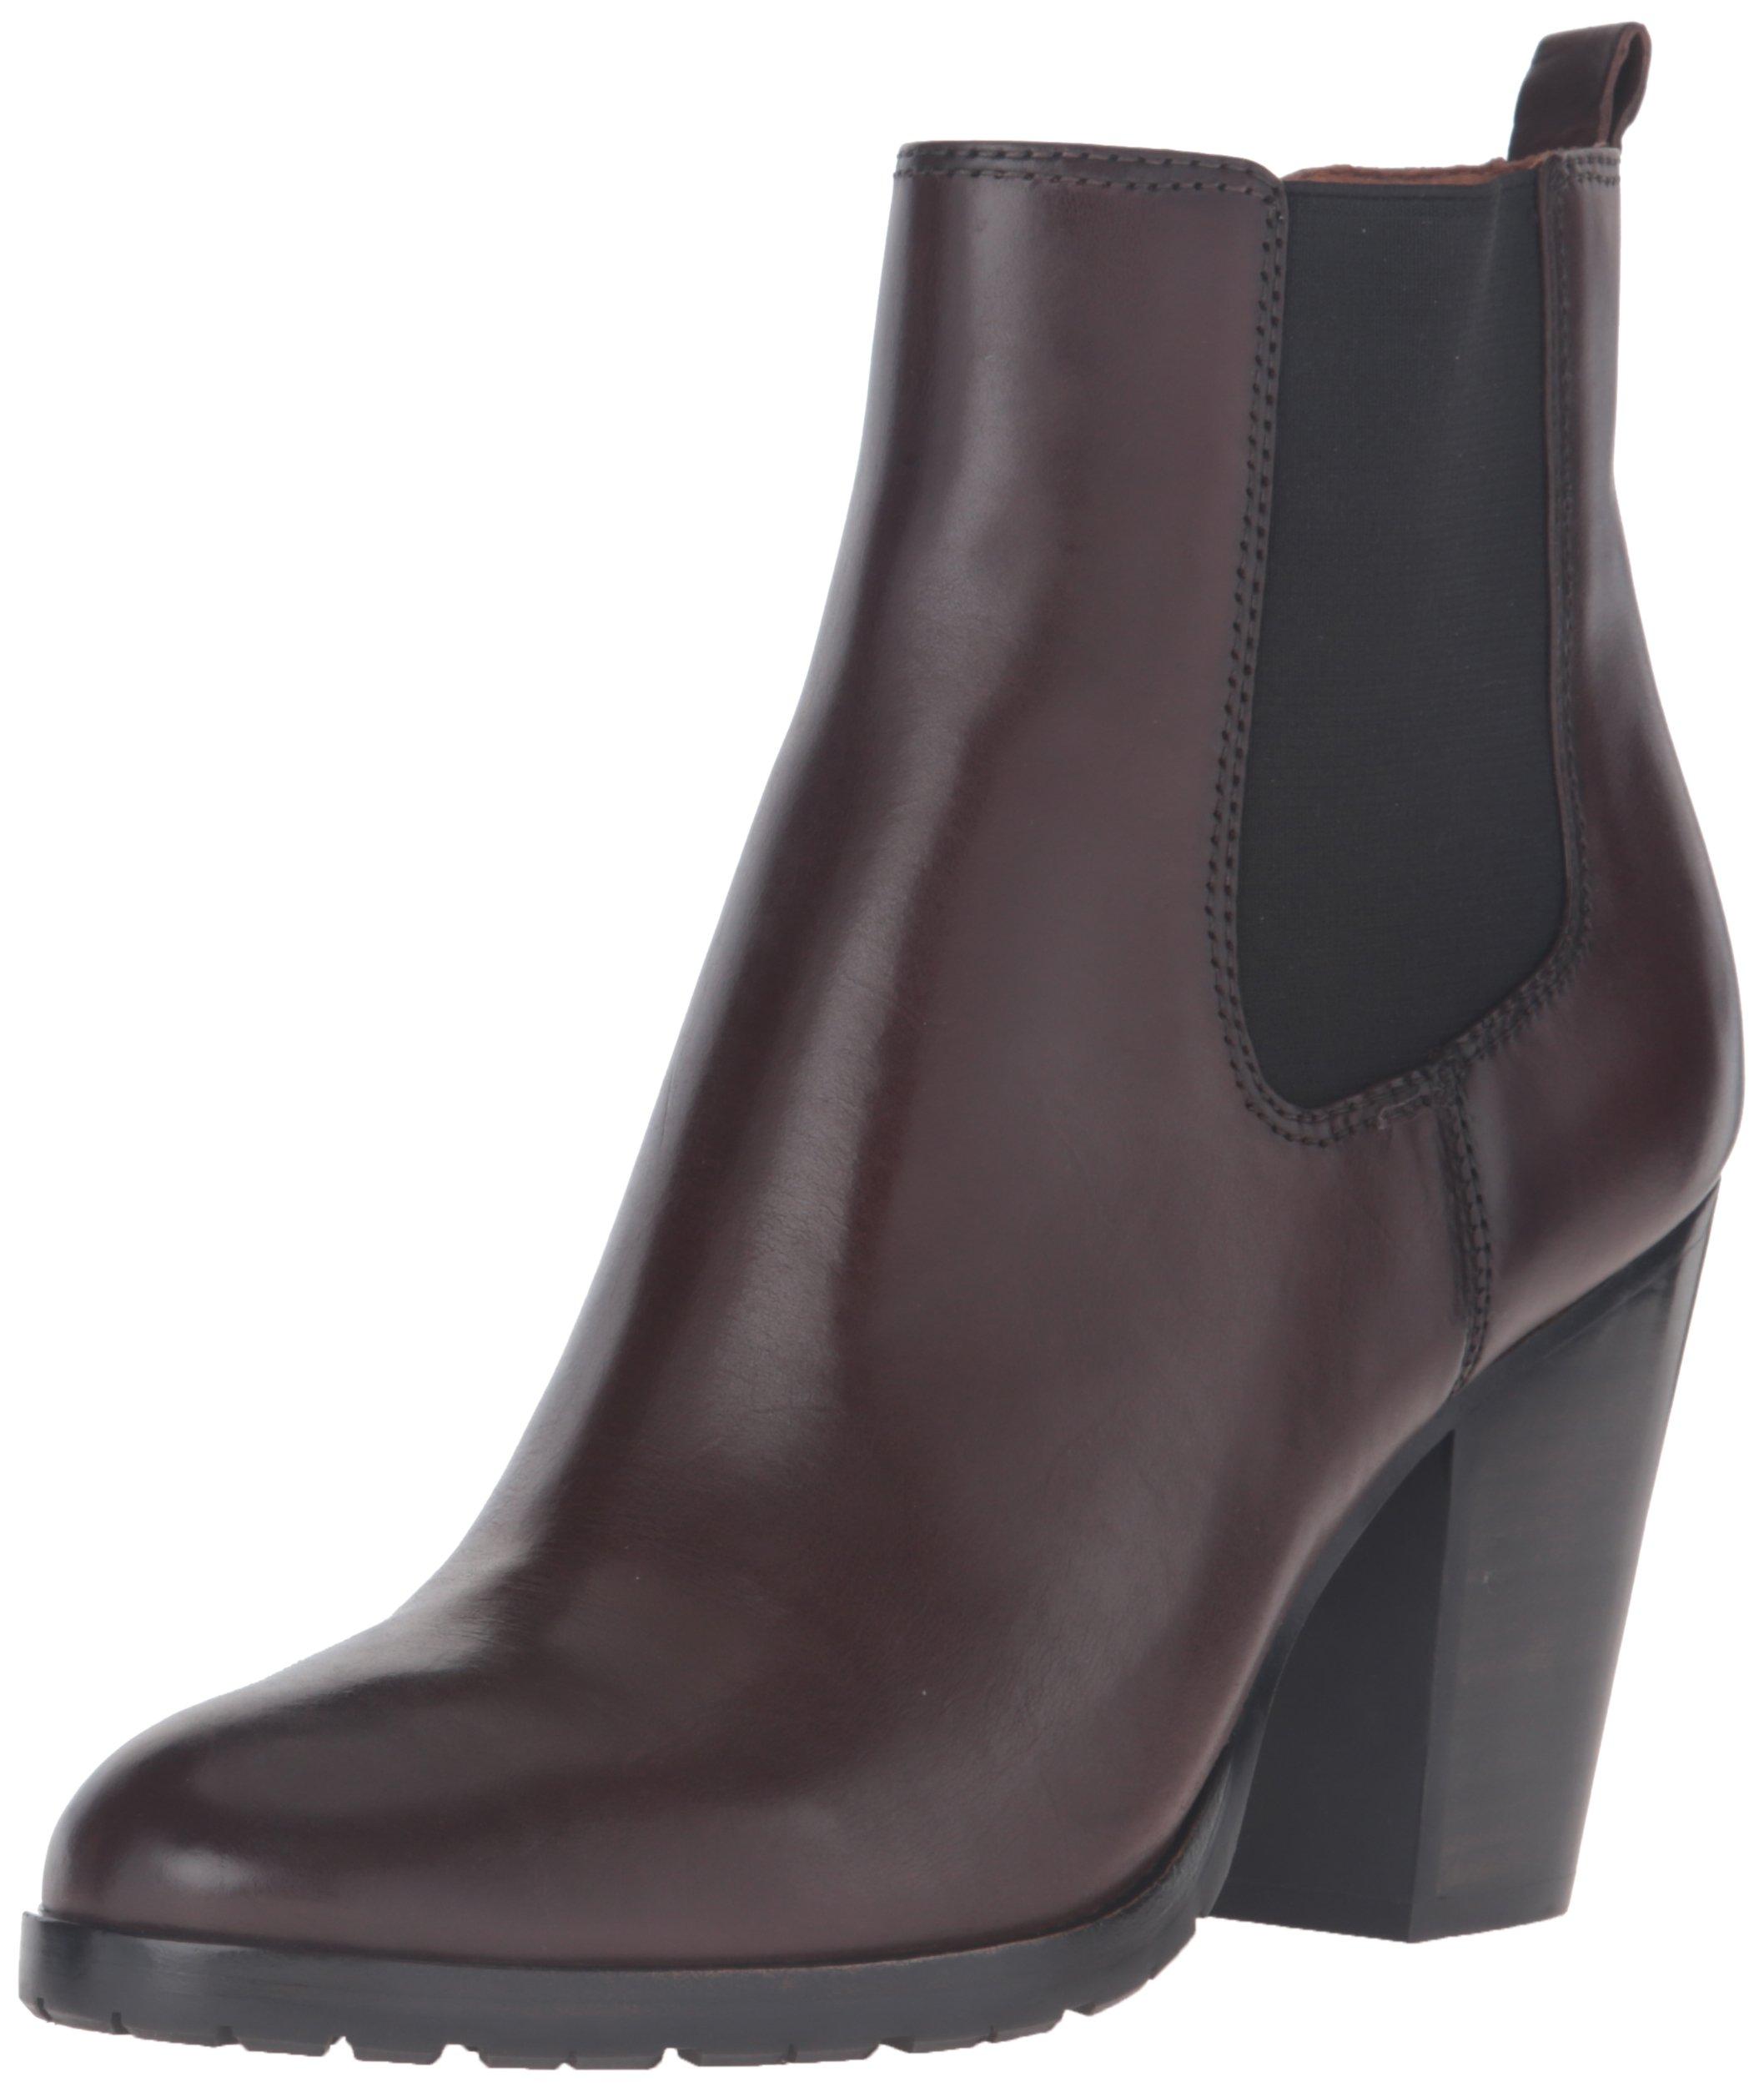 FRYE Women's Tate Chelsea Boot, Dark Brown, 8 M US